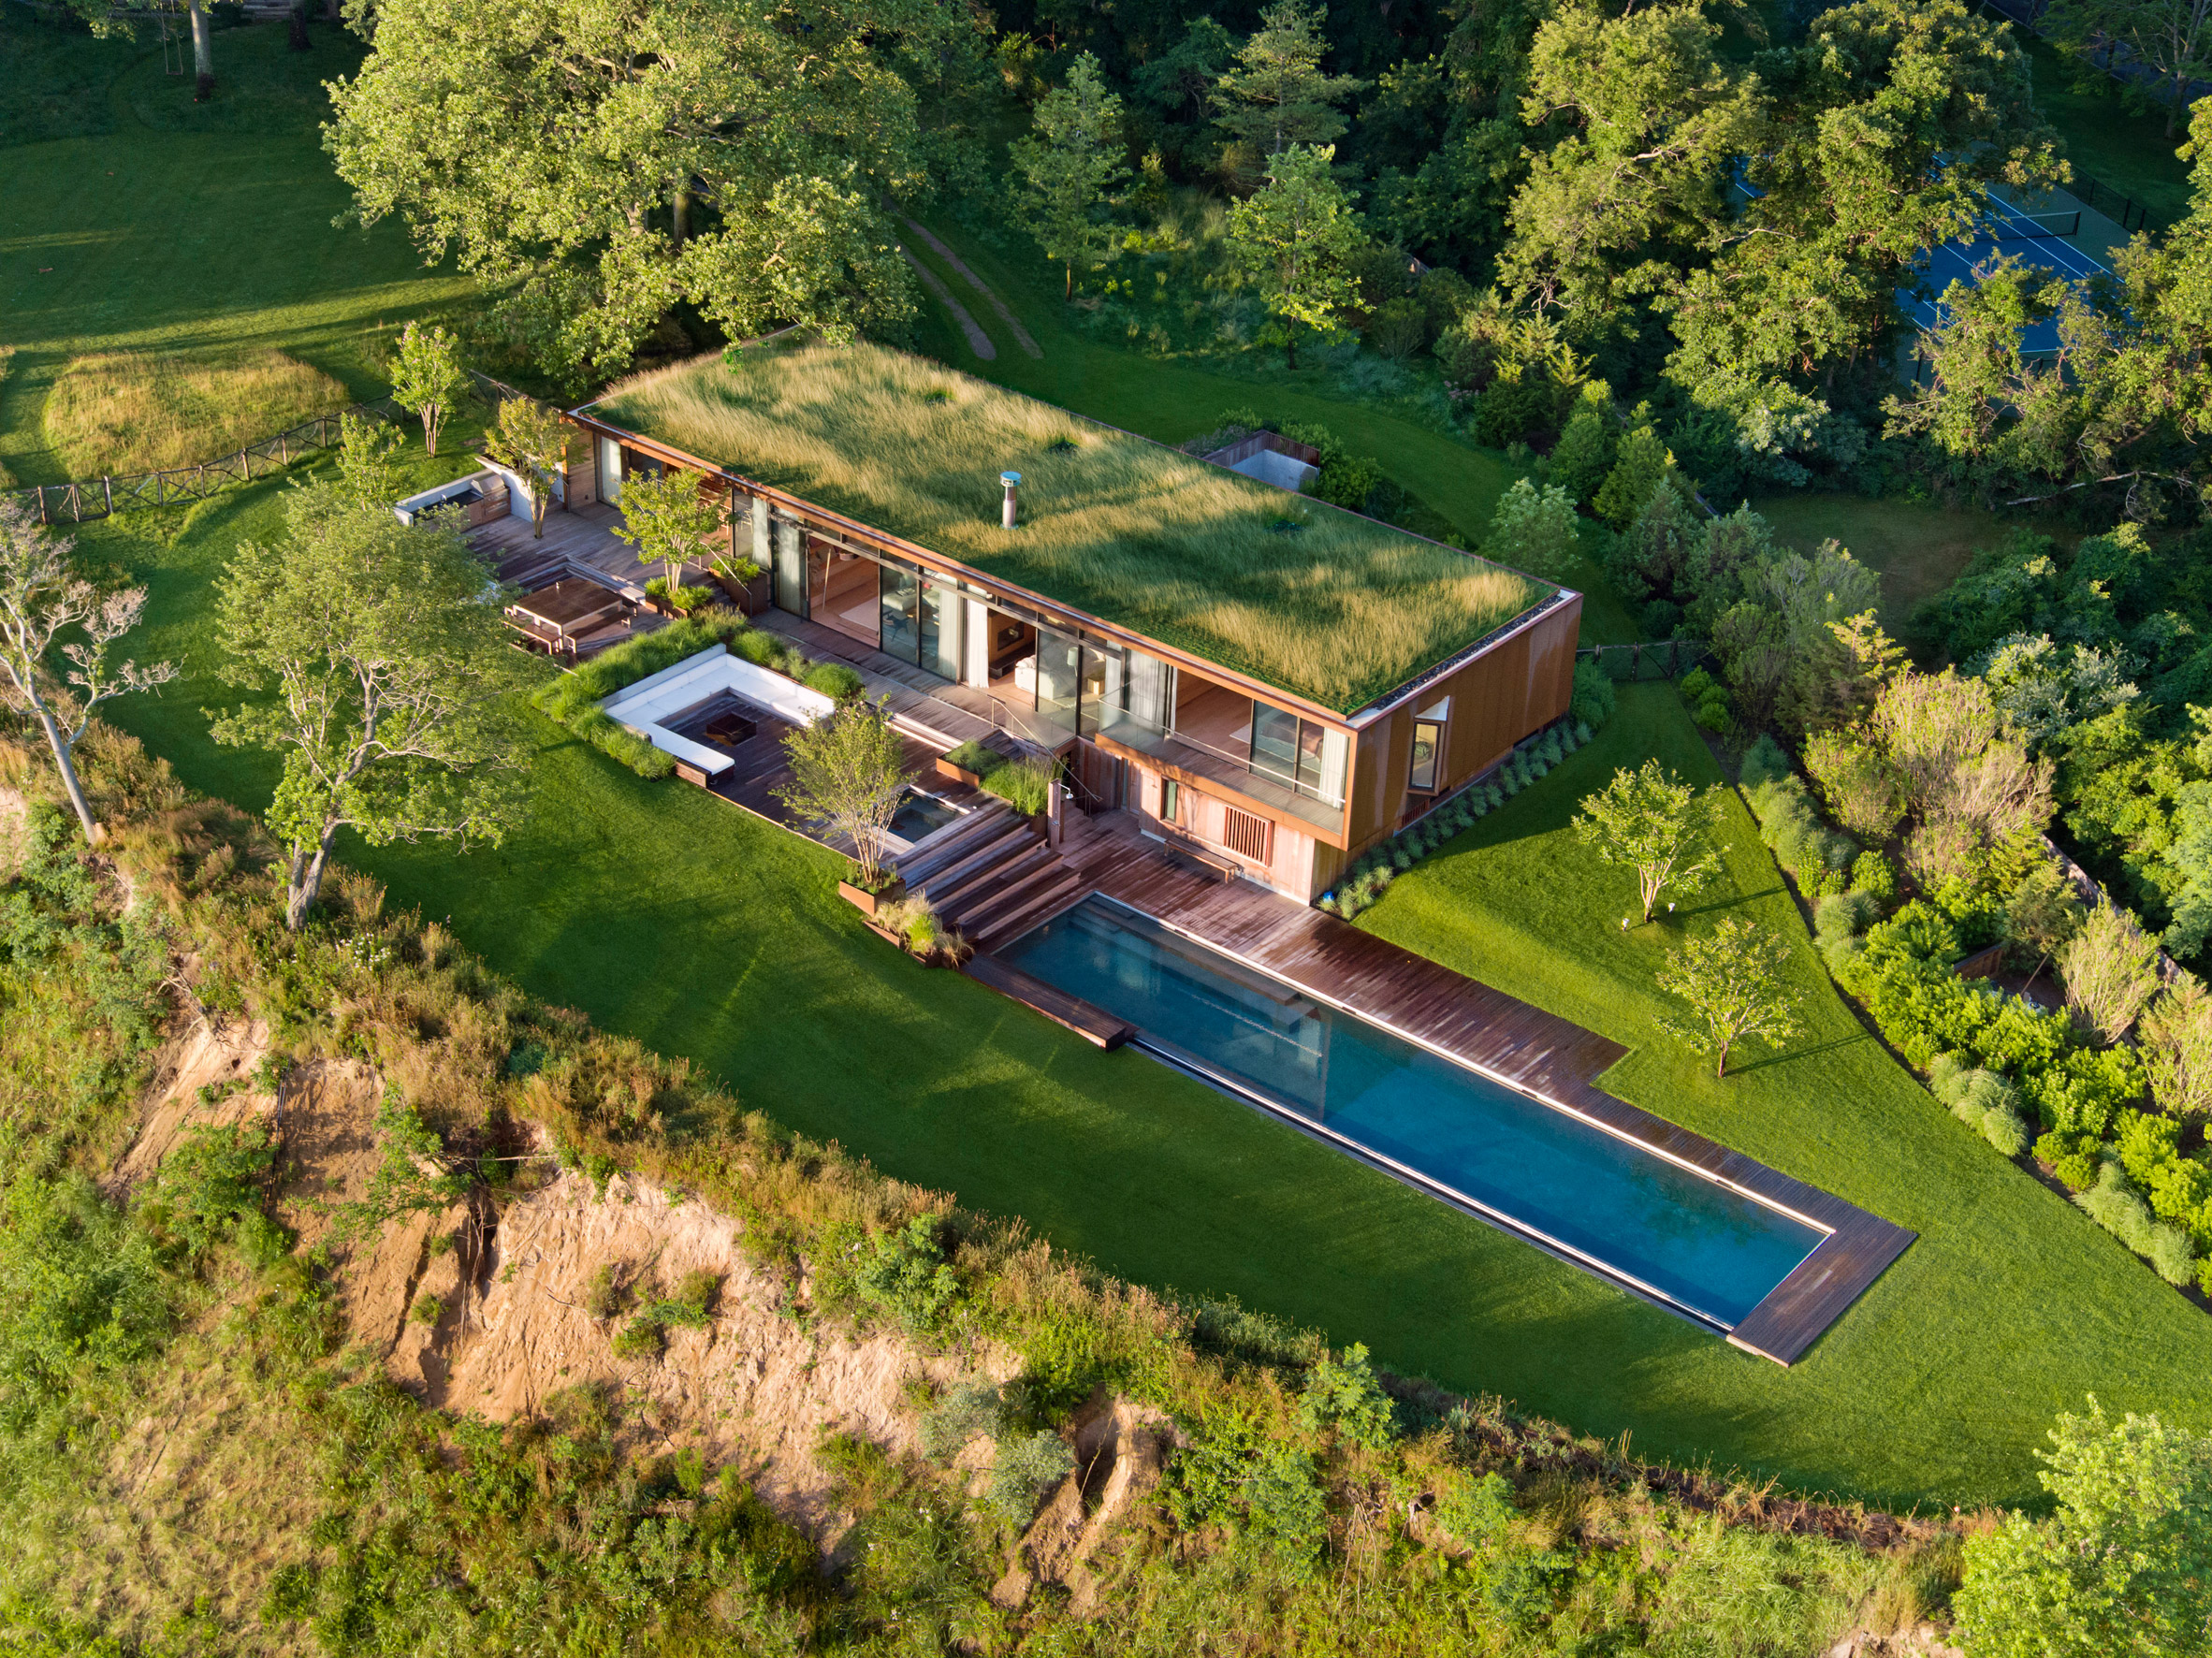 peconic-house-mapos-studio-hamptons-long-island-new-york_dezeen_2364_col_2.jpg